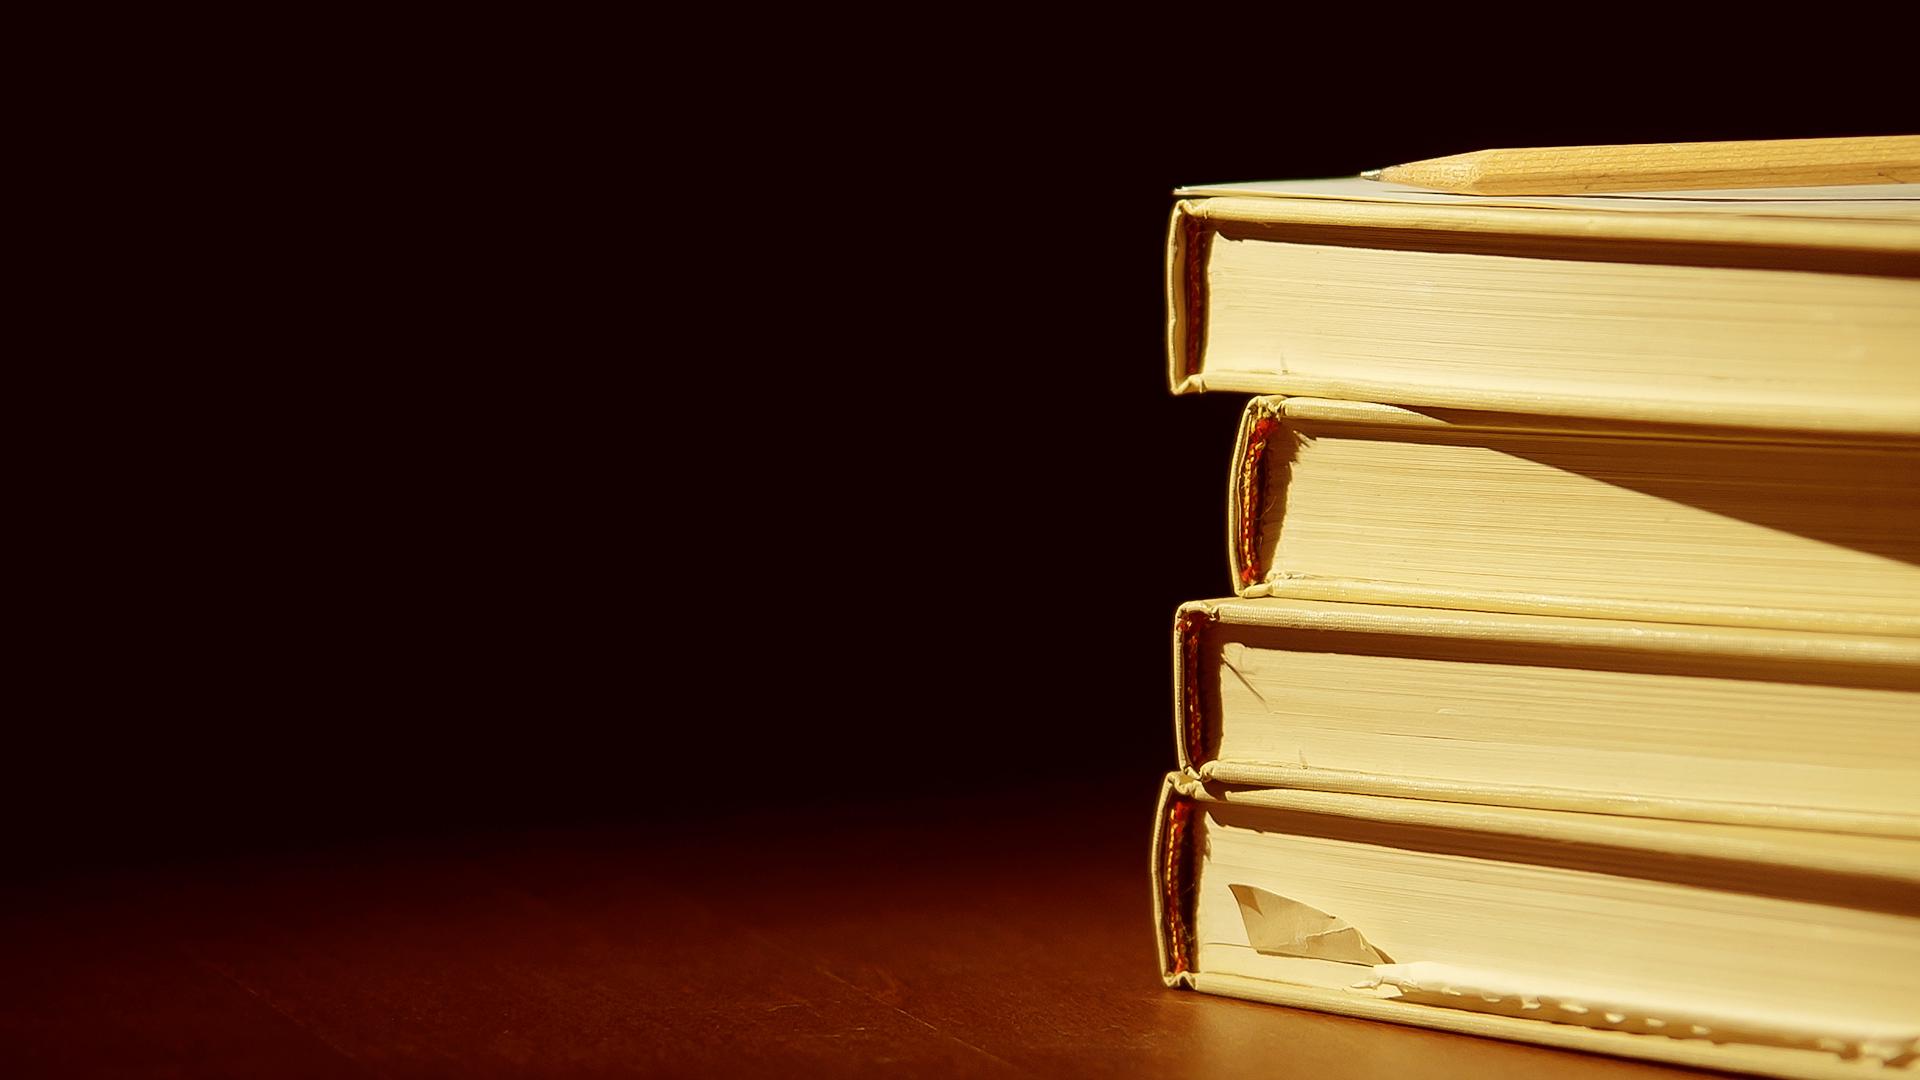 books wallpaper 49796 1920x1080 px ~ hdwallsource